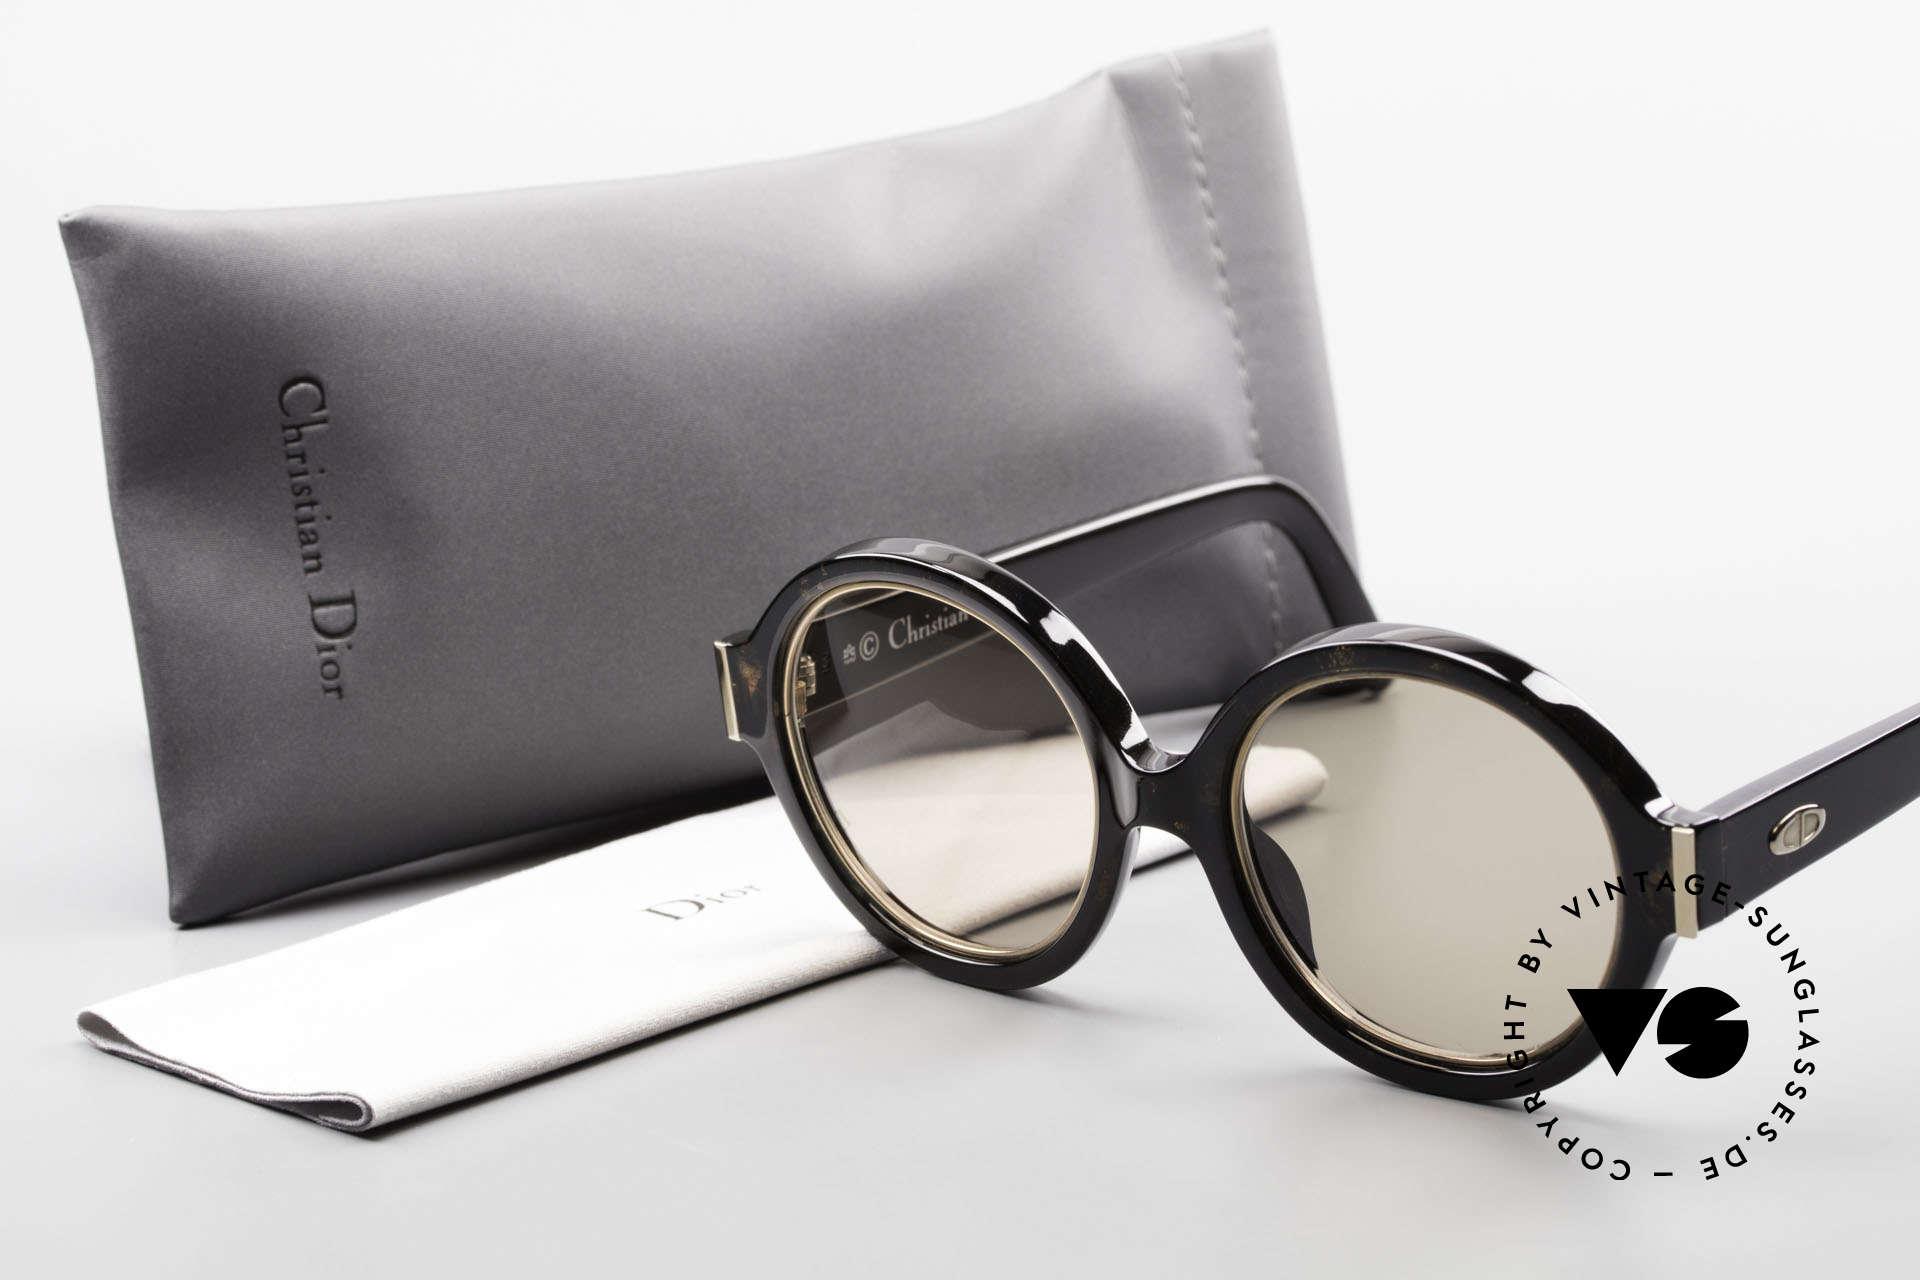 Christian Dior 2446 Round Ladies Sunglasses 80's, Size: medium, Made for Women